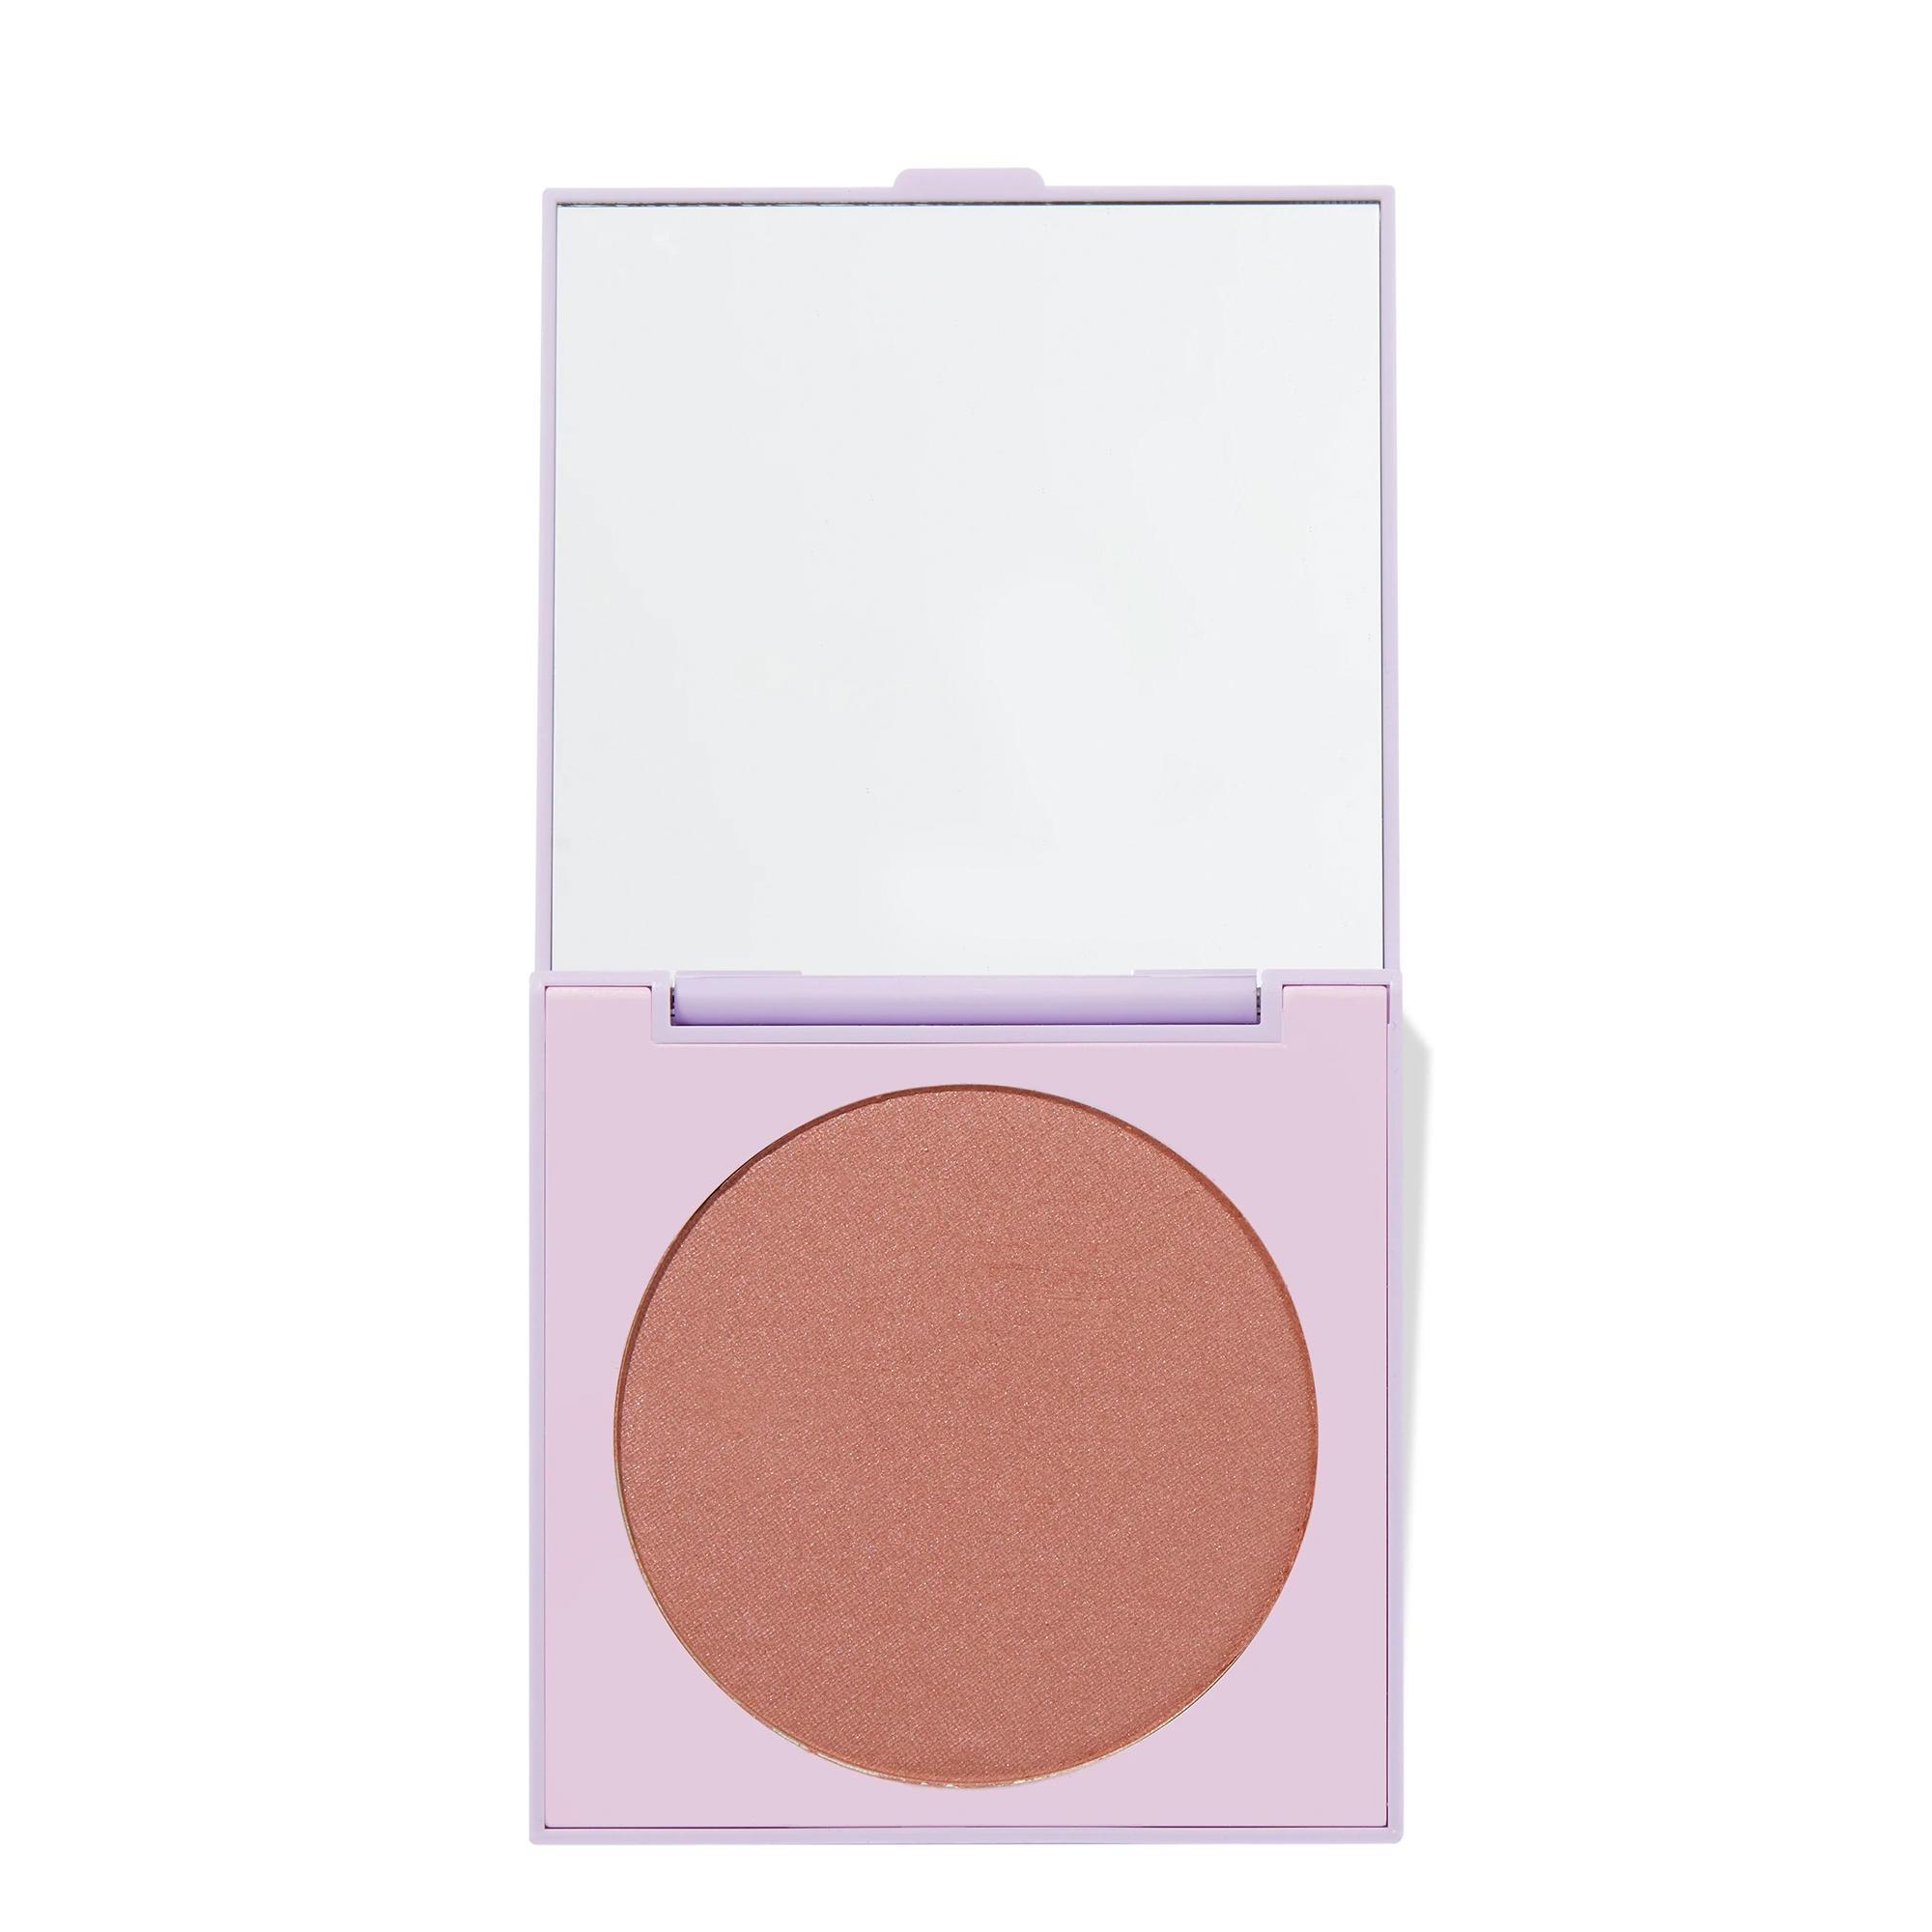 ColourPop Pressed Powder Blush I Need Space